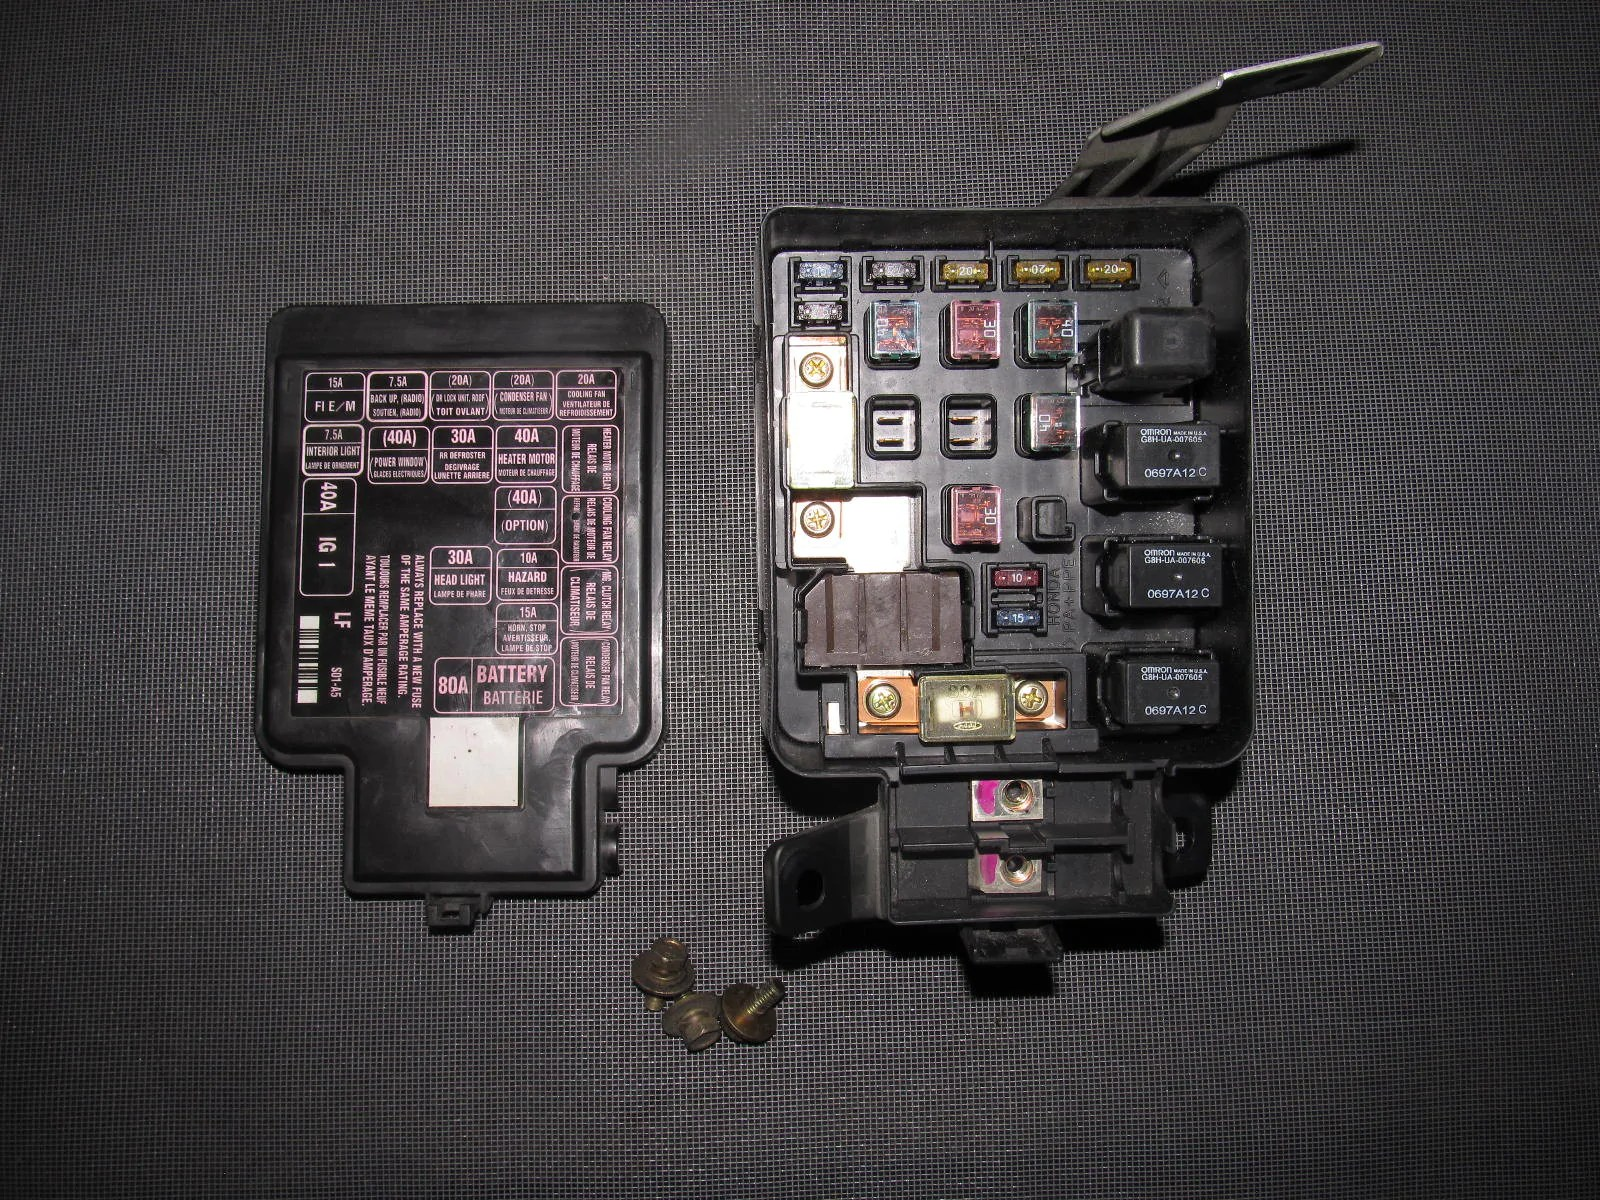 medium resolution of 99 civic fuse box blog wiring diagram 95 civic fuse box wiring civic fuse box wiring